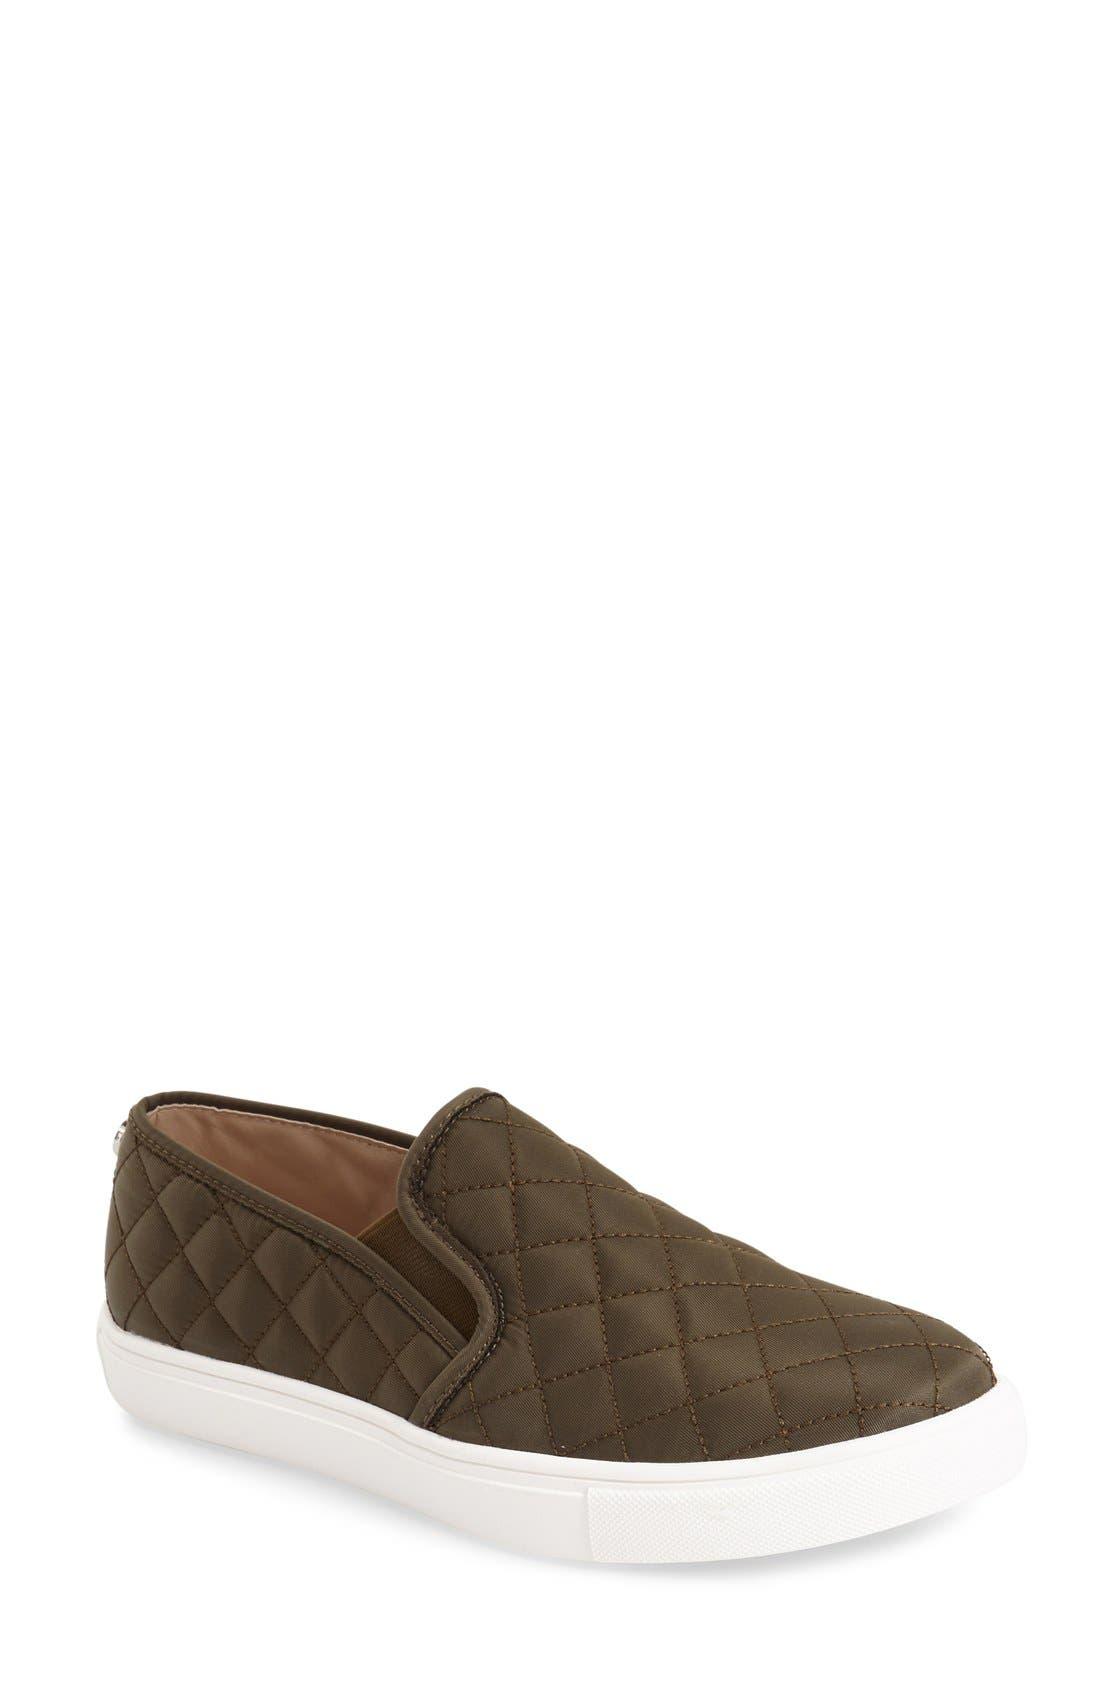 STEVE MADDEN 'Ecntrcqt' Sneaker, Main, color, 300